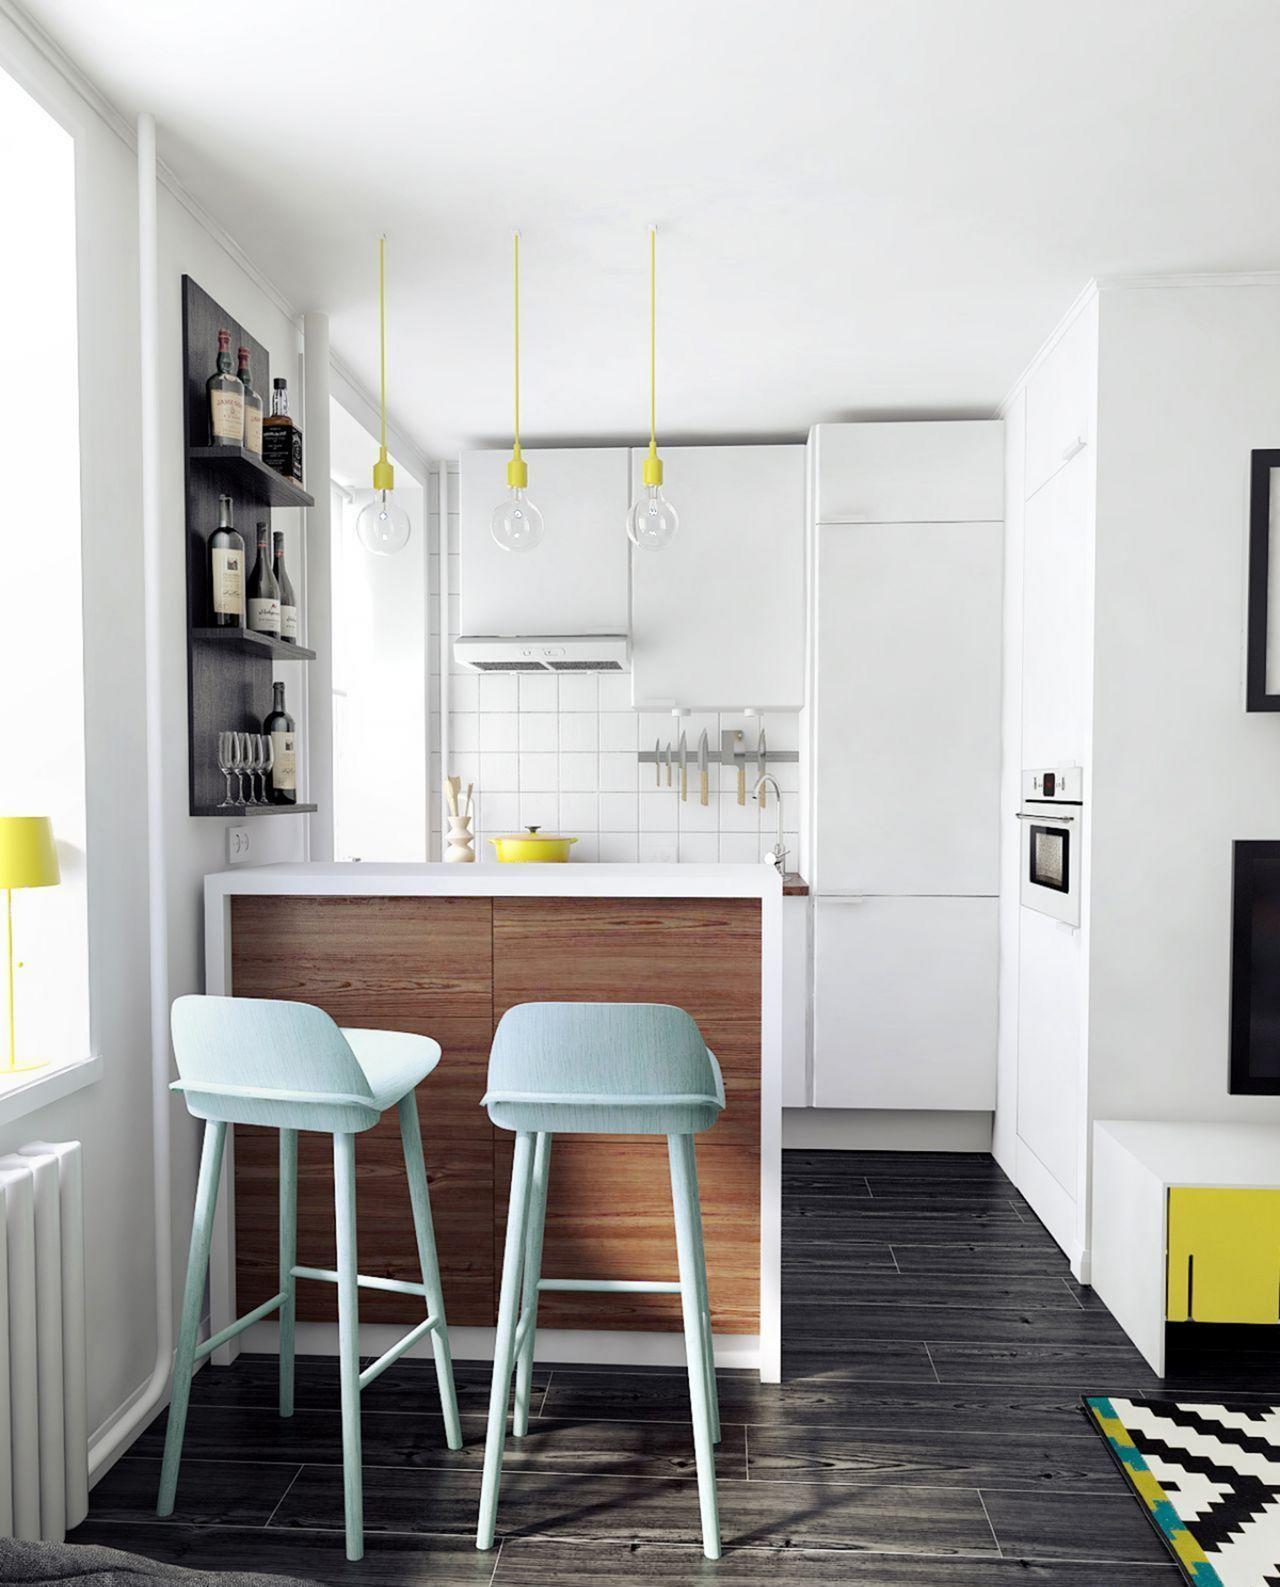 35 Outstanding Small Kitchen Studio Designs For Comfort Dexorate Kitchen Remodel Small Kitchen Design Small Interior Design Kitchen